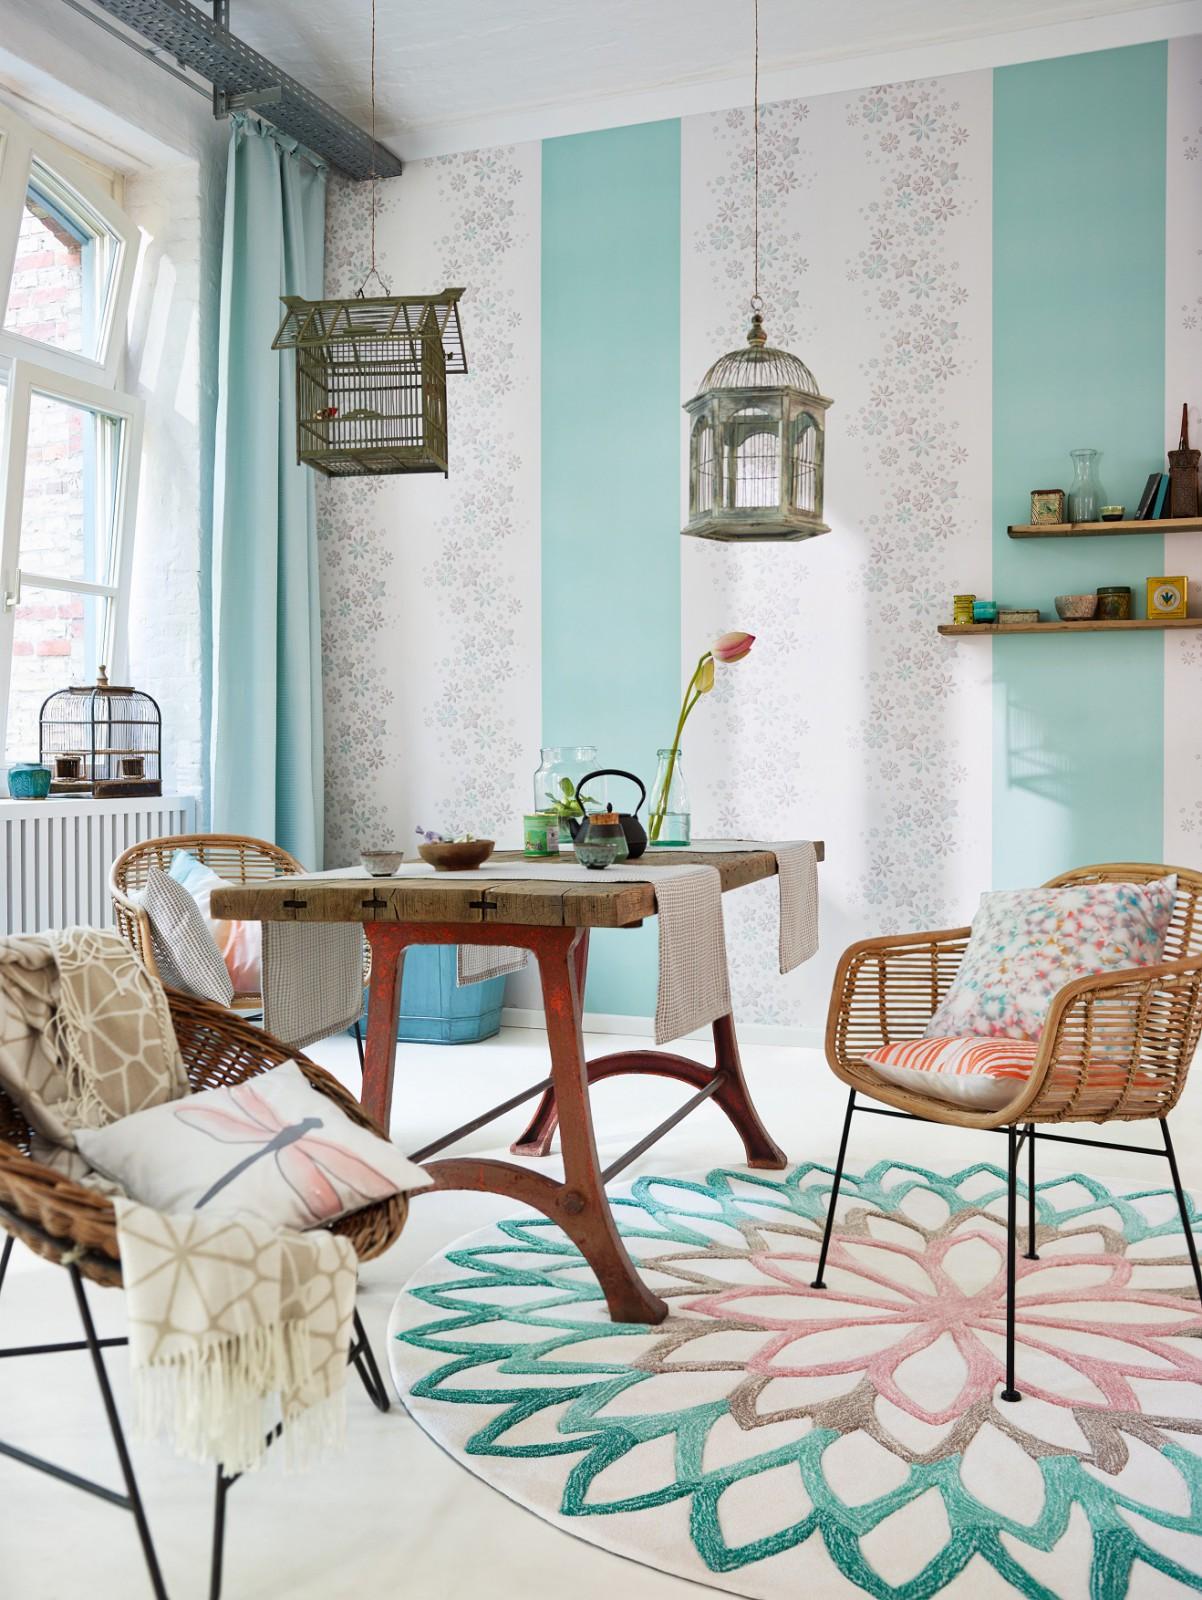 wallpaper esprit home uni turquoise 30305 6. Black Bedroom Furniture Sets. Home Design Ideas